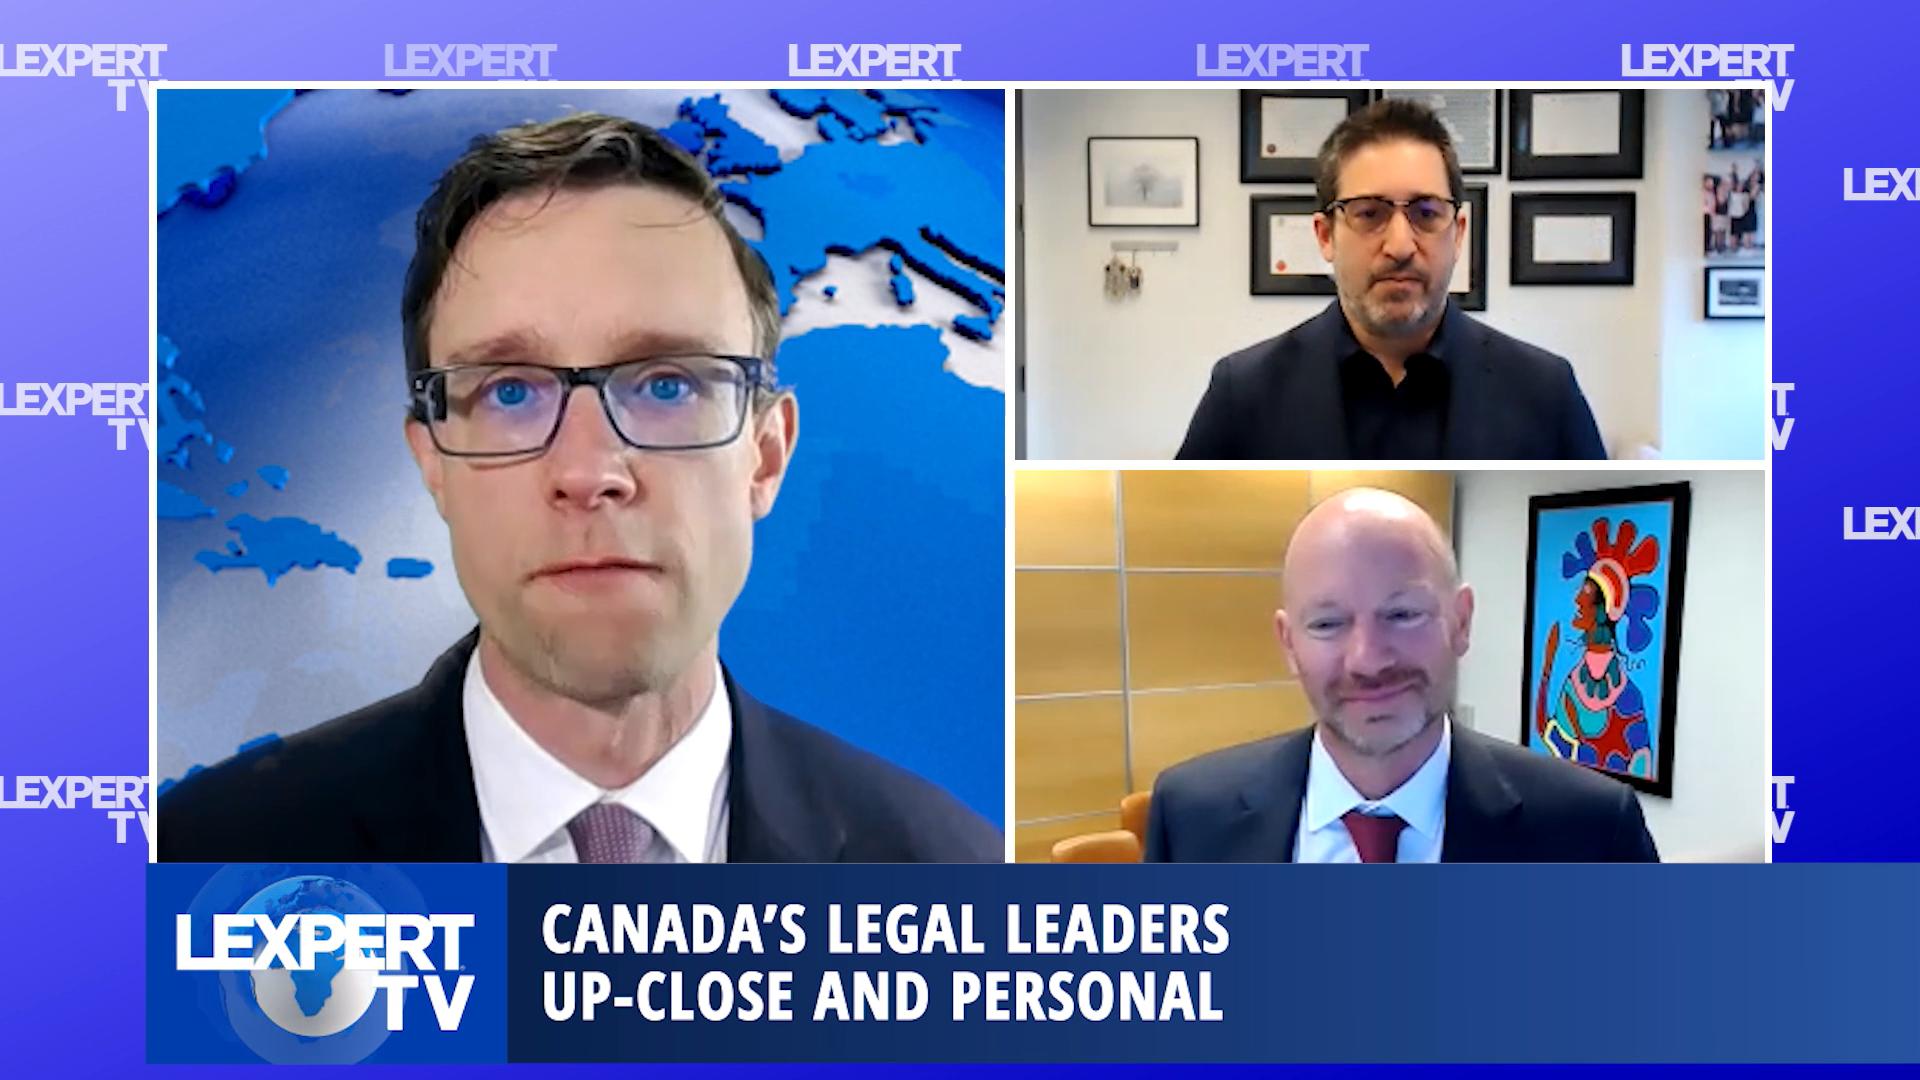 Lexpert TV - Greg Neinstein, Managing Partner and Duncan Embury, Lead Medical Malpractice Lawyer, Neinstein Personal Injury Lawyers